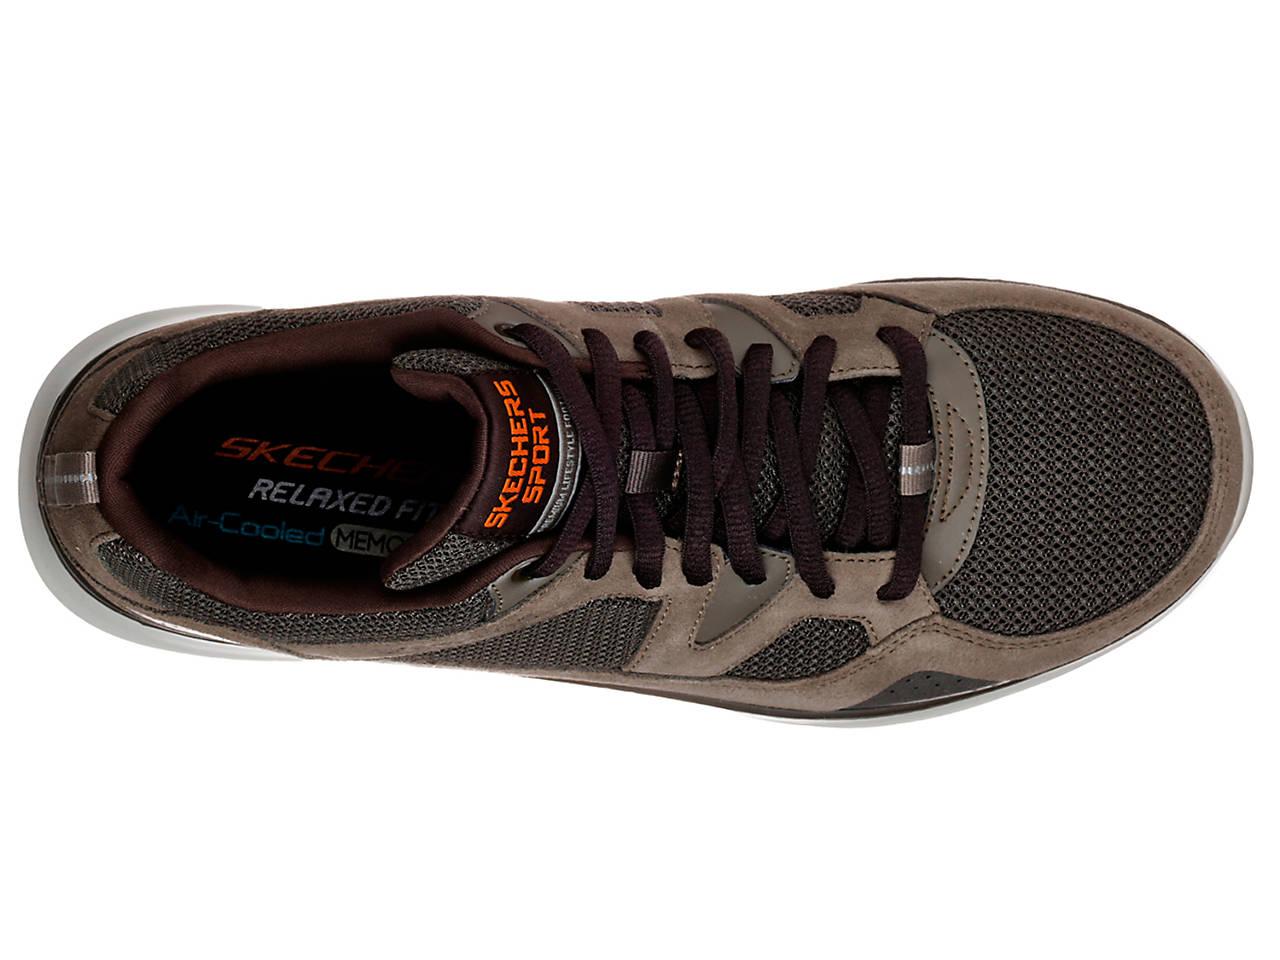 Skechers Relaxed Fit Quantum Flex Sneaker Men's Men's